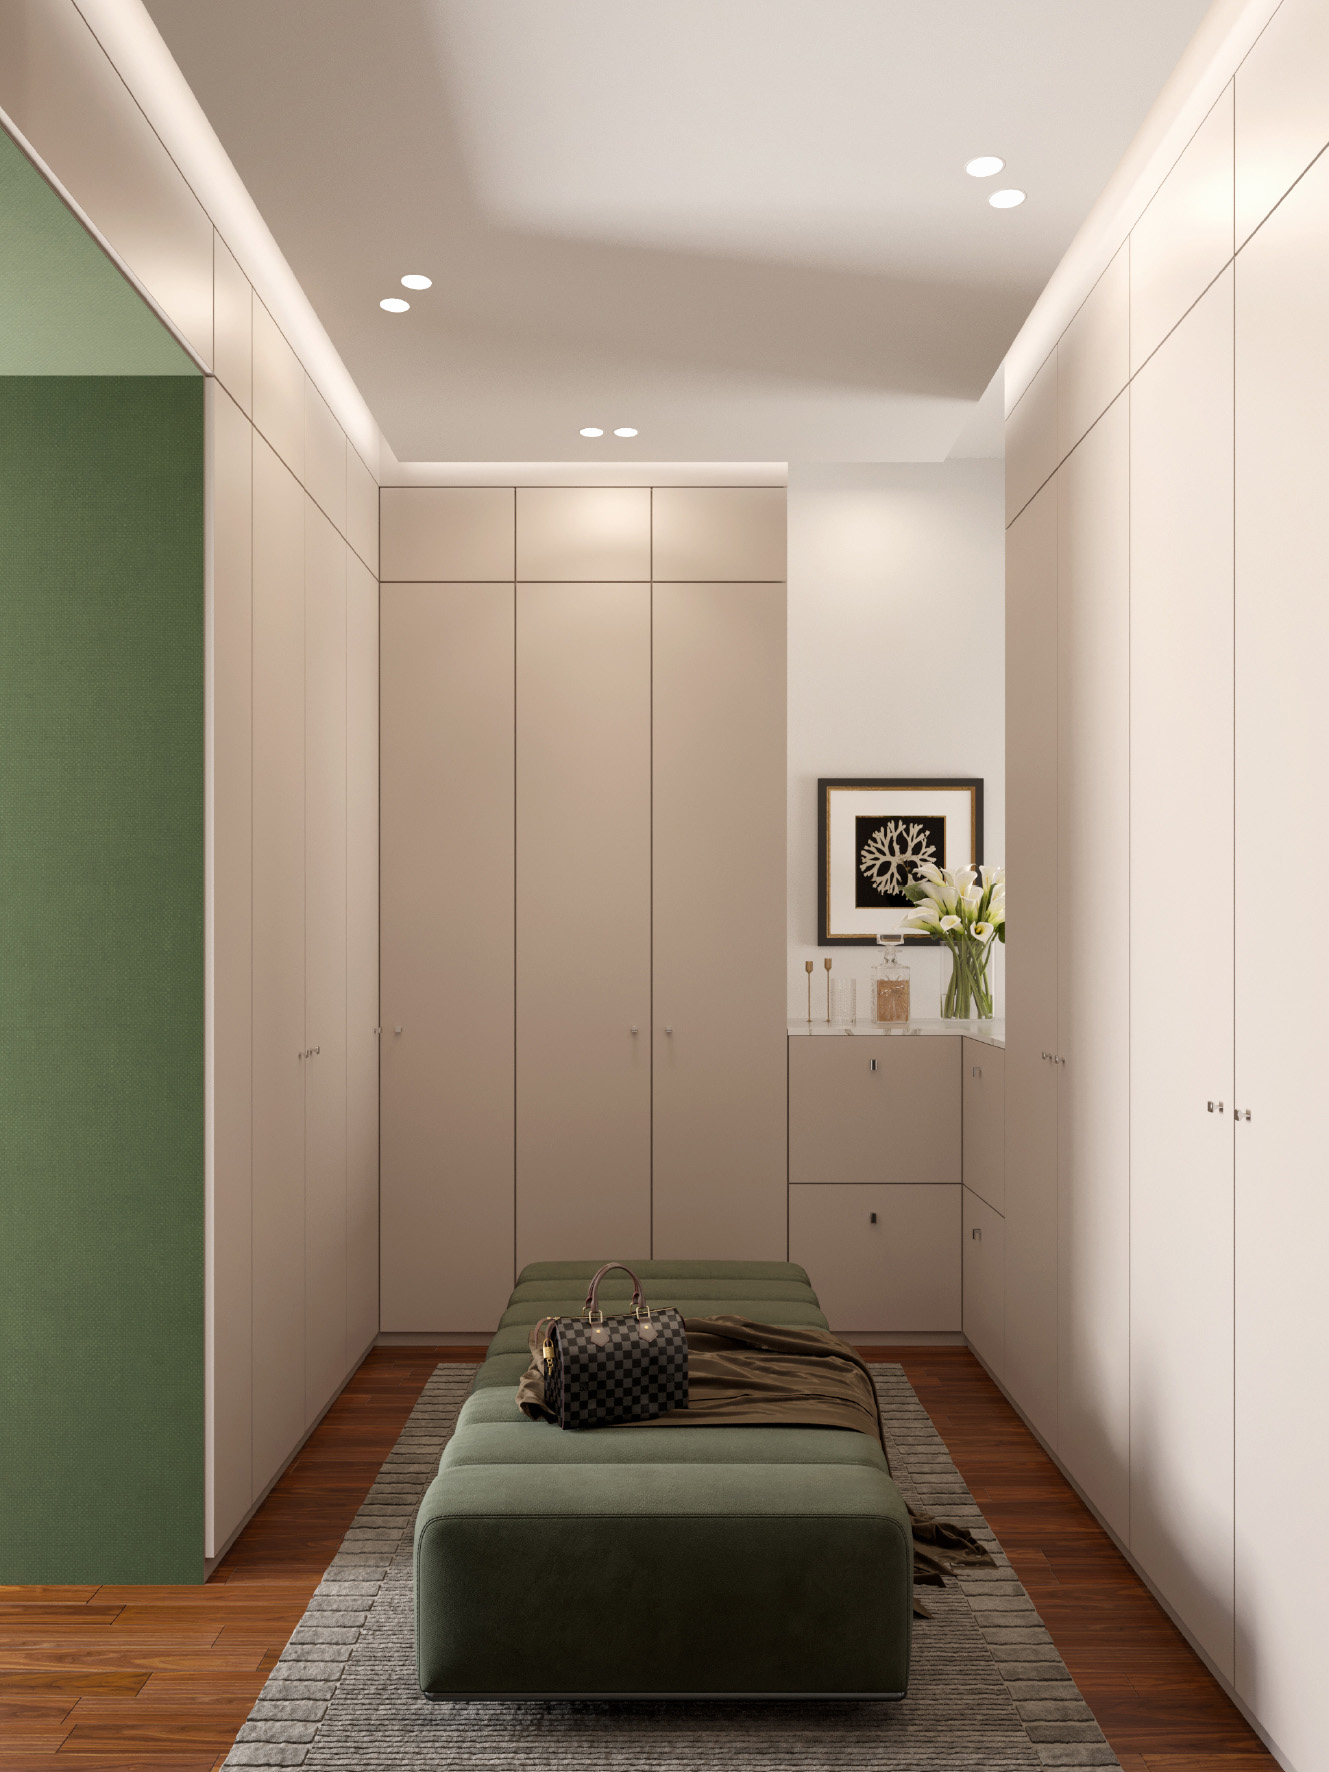 LV303 Bedroom 2